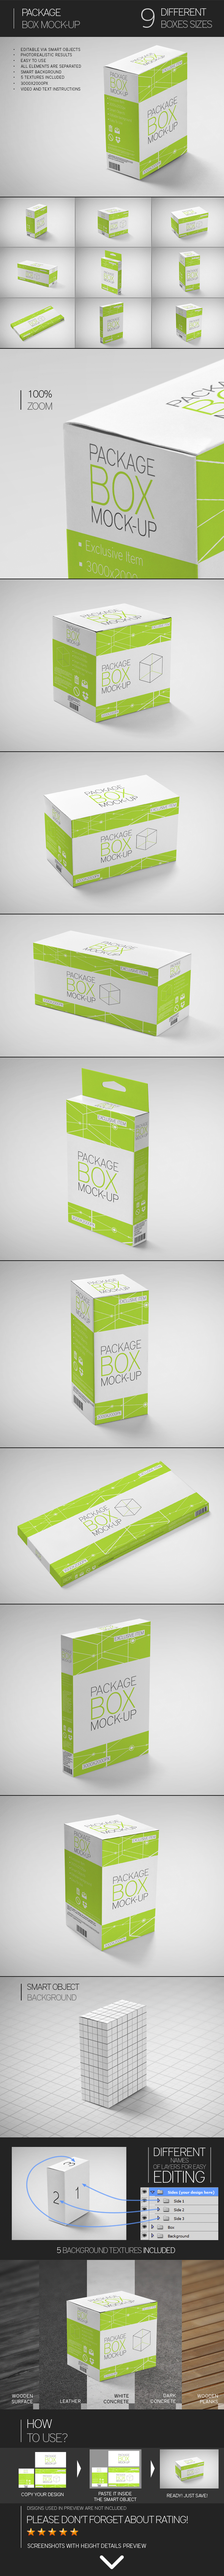 Download Package Box Mock Up By Eugene Smith Via Behance Packaging Template Design Mockup Design Packaging Mockup